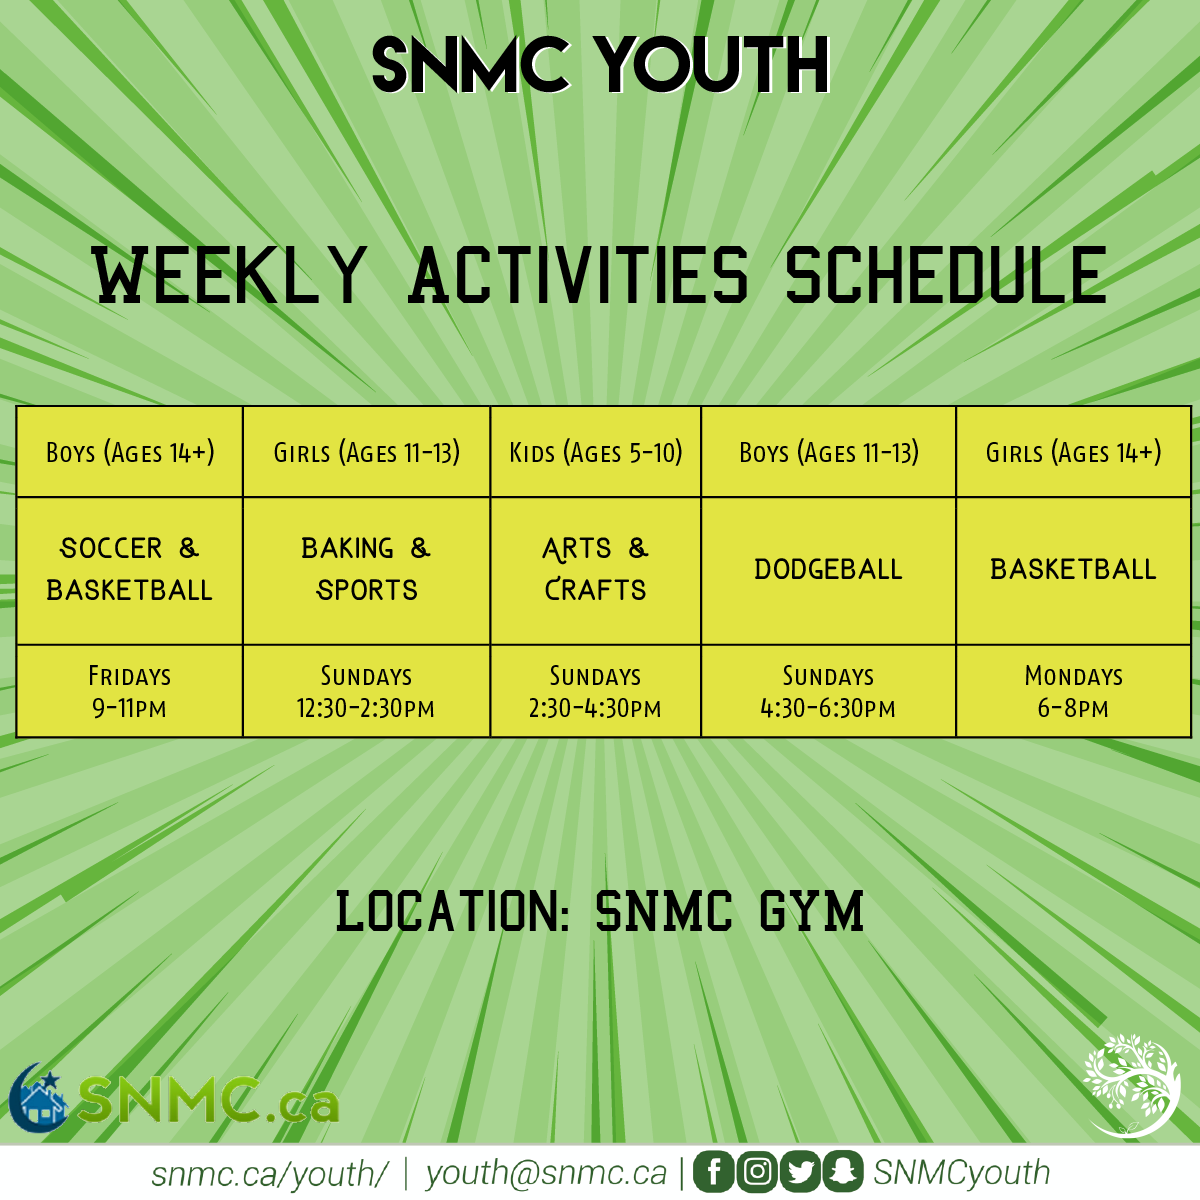 SNMC Weekly Activities